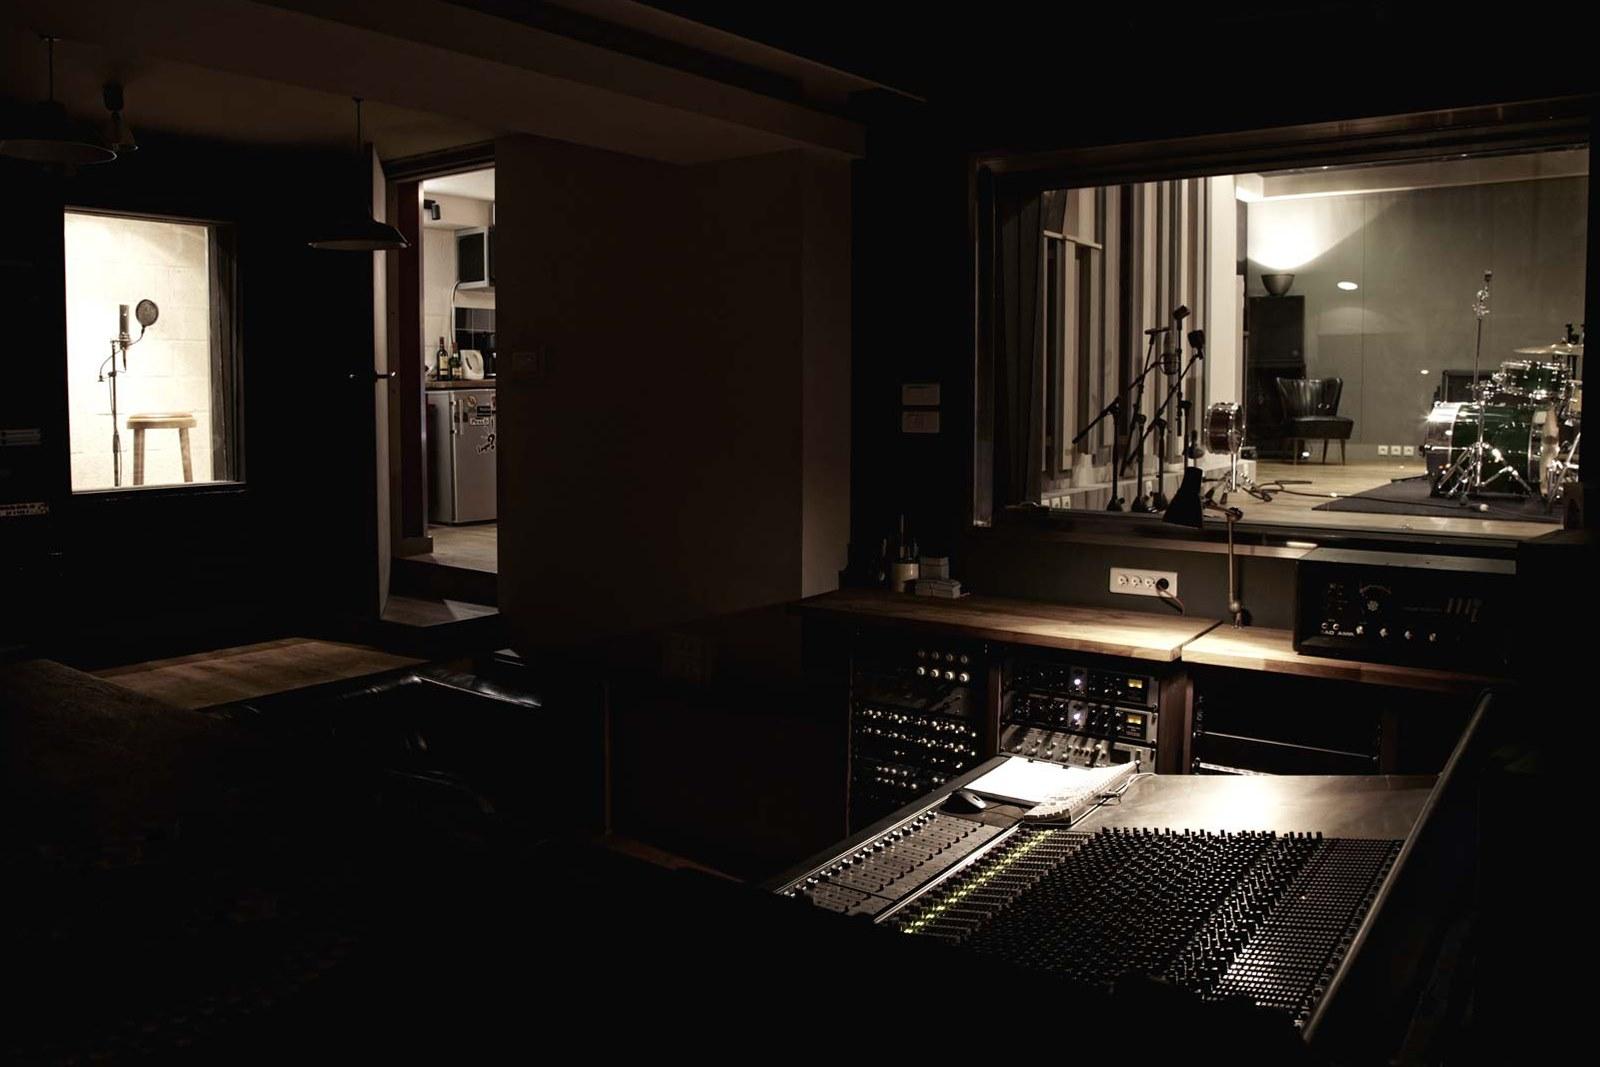 studio musique paris idf onetwopassit. Black Bedroom Furniture Sets. Home Design Ideas